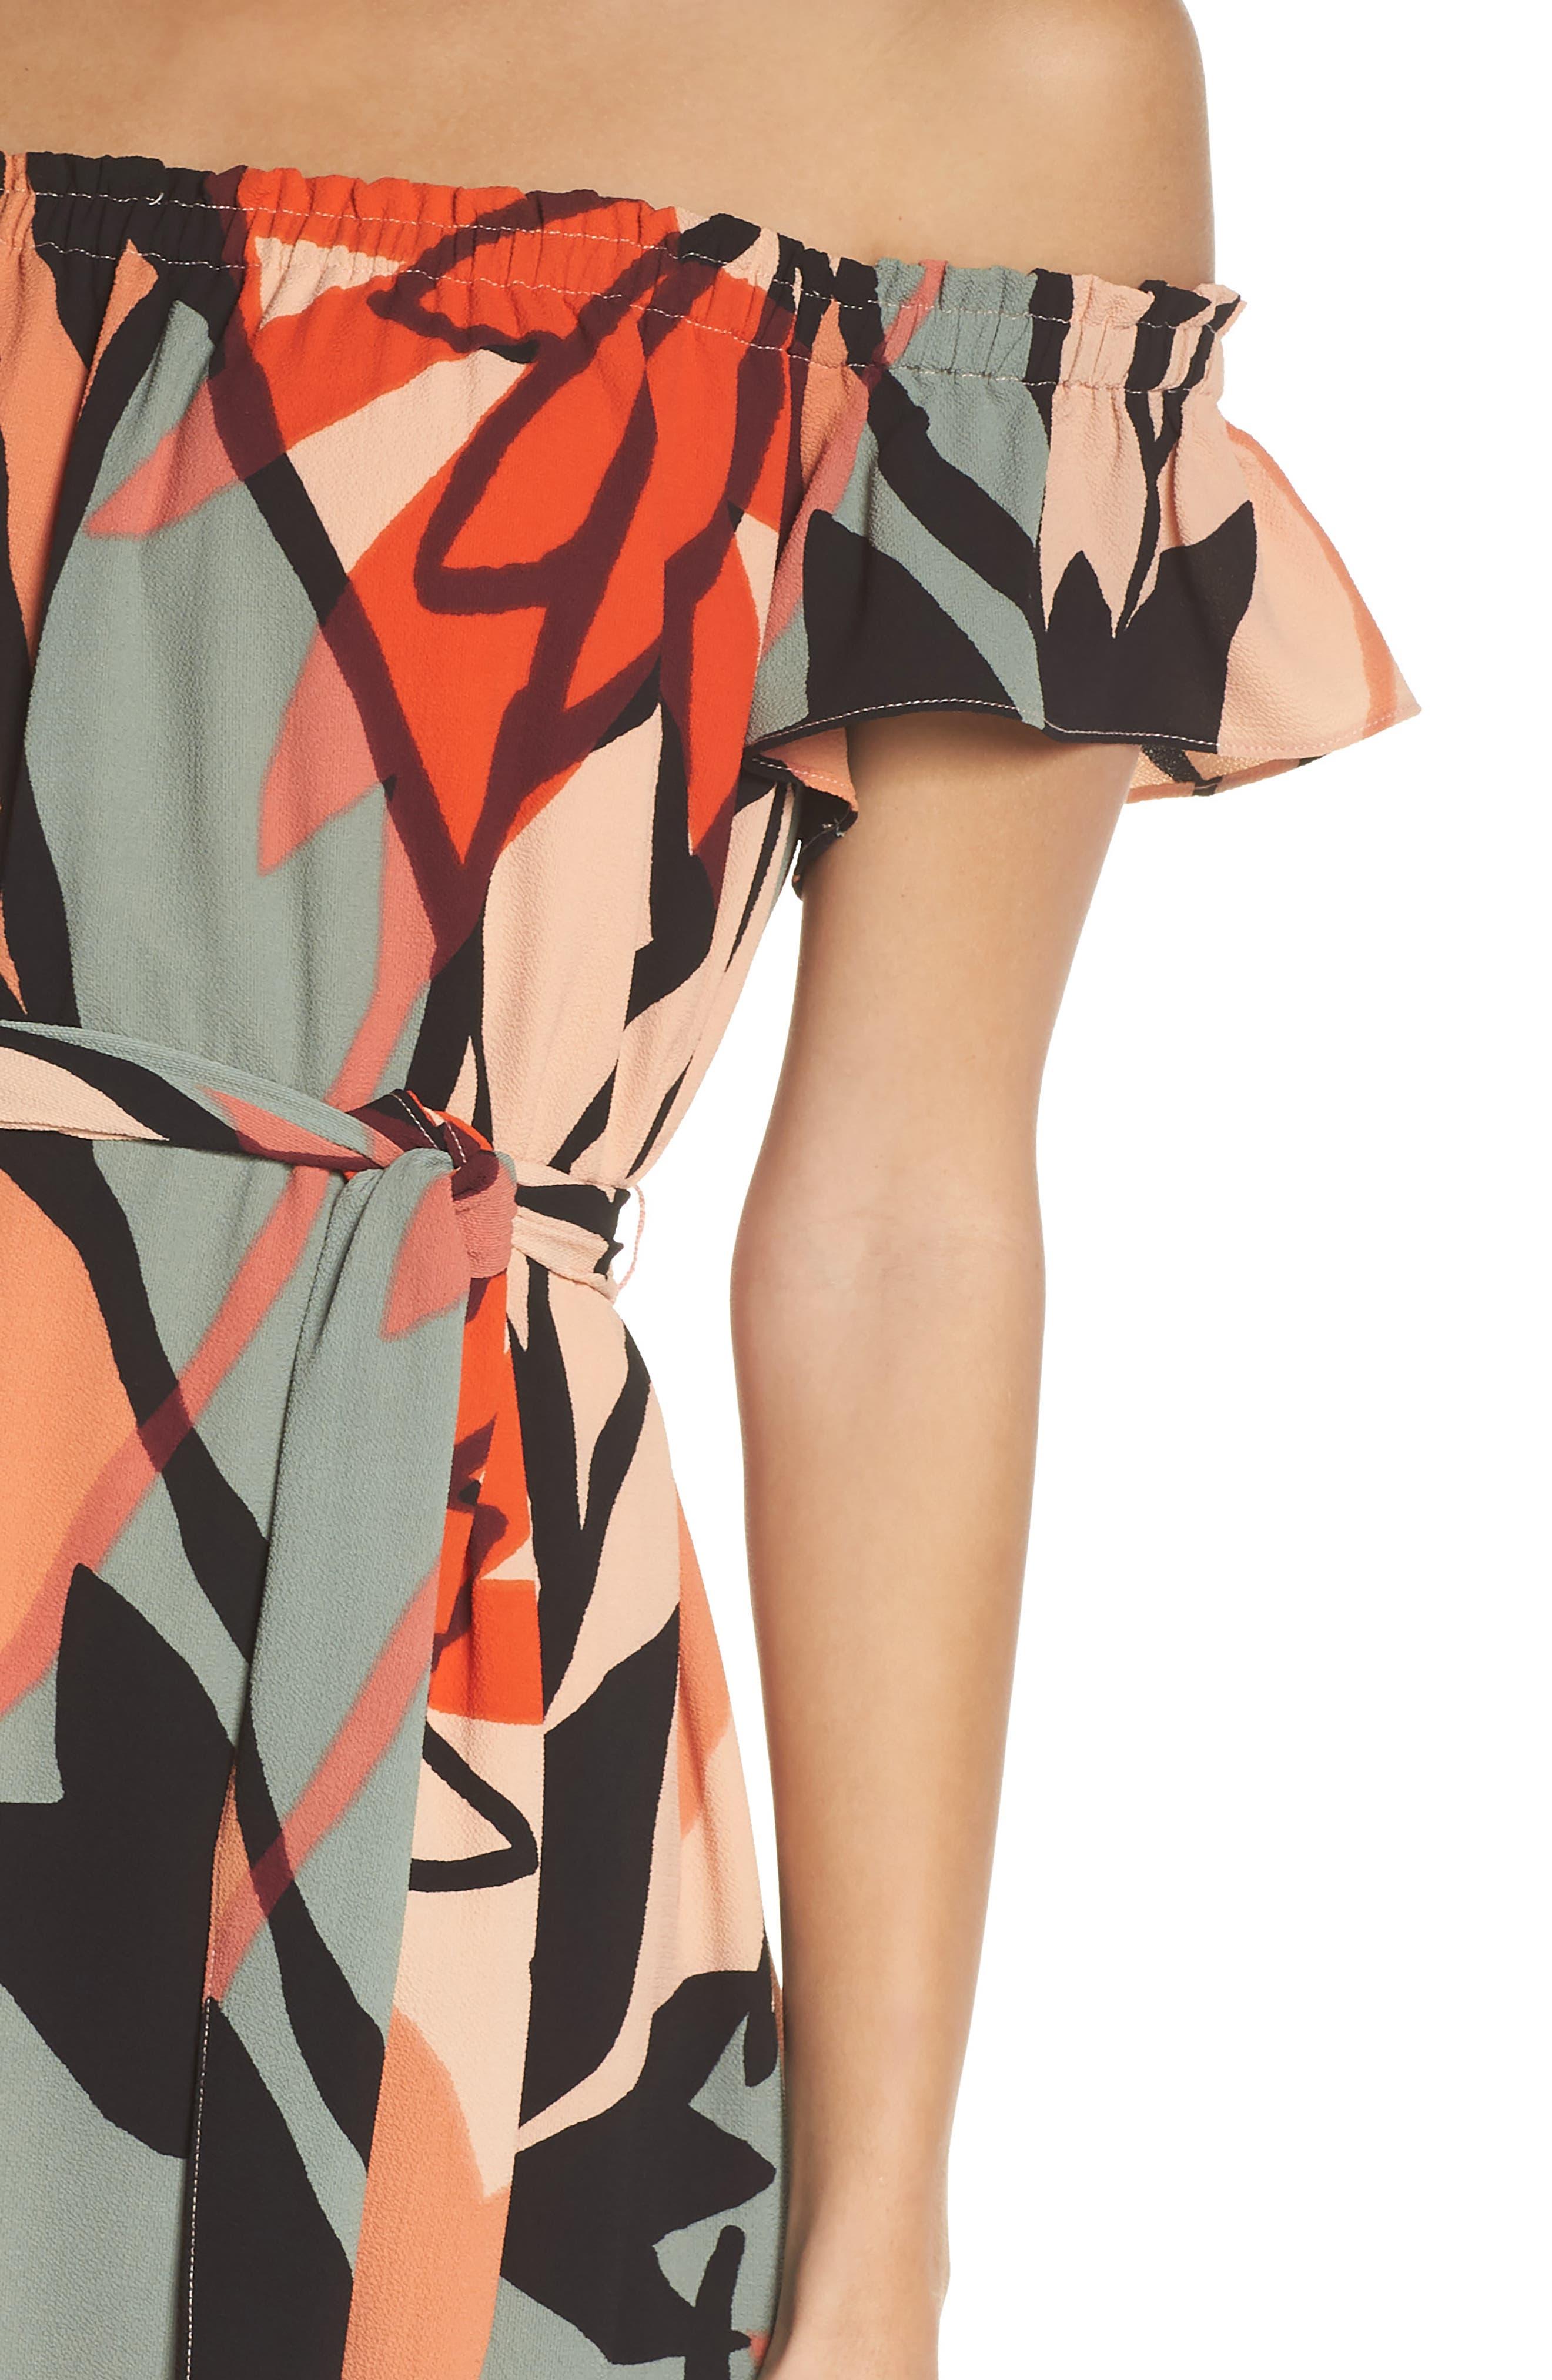 CLOVER AND SLOANE,                             Off the Shoulder Bubble Crepe Dress,                             Alternate thumbnail 4, color,                             800